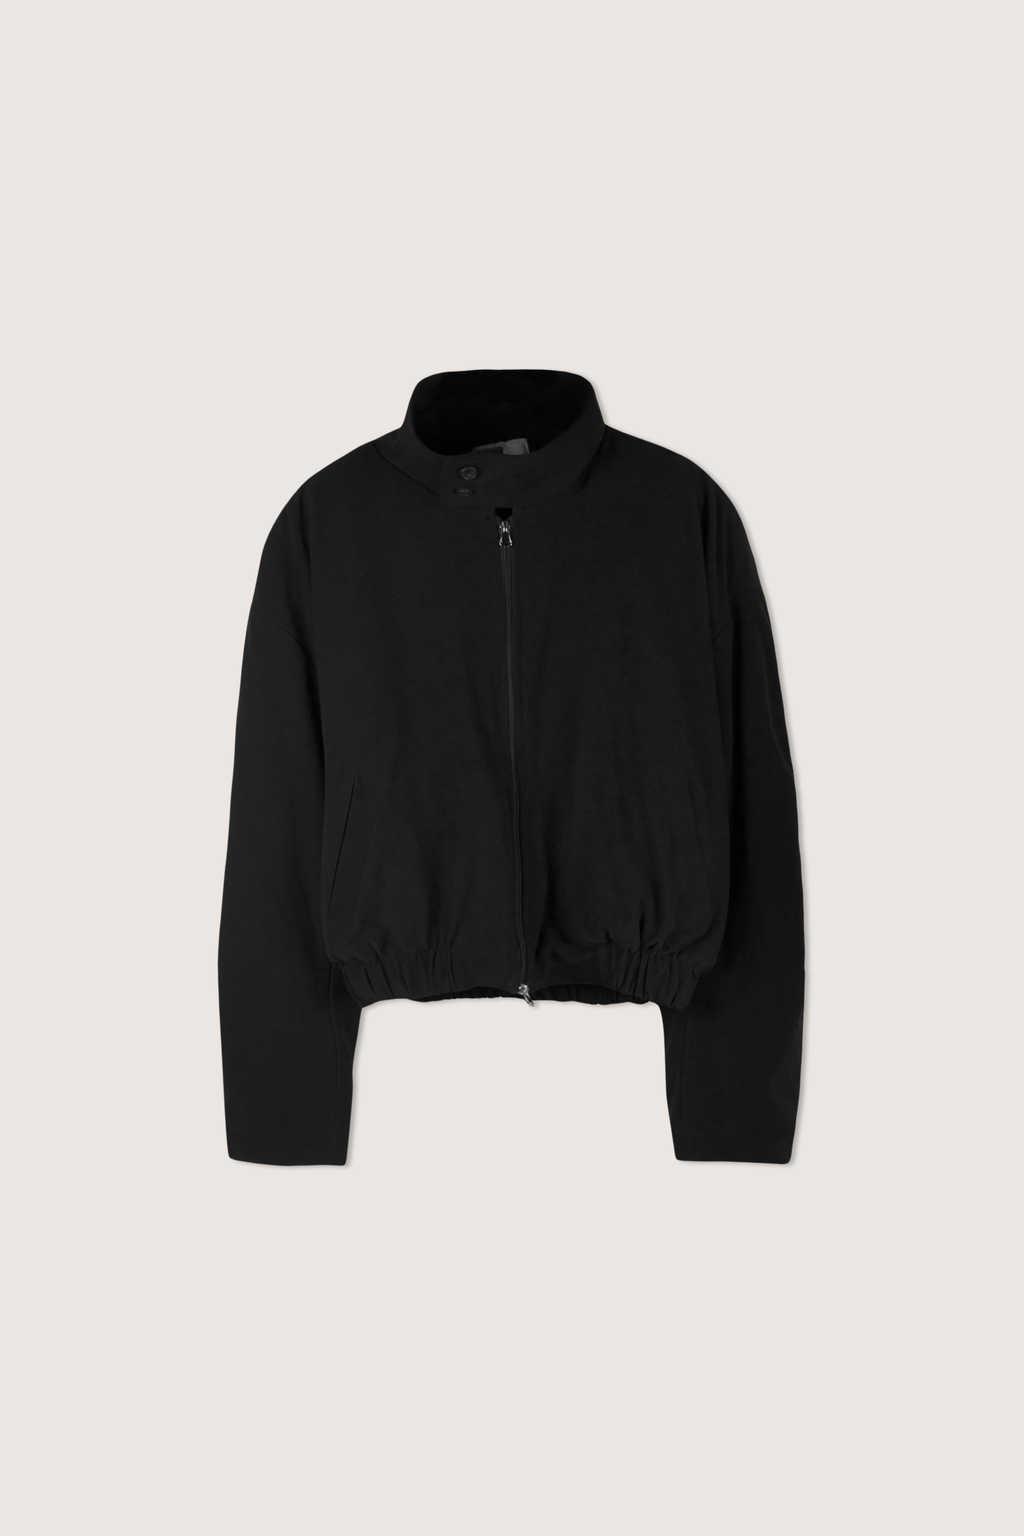 Jacket H182 Black 5